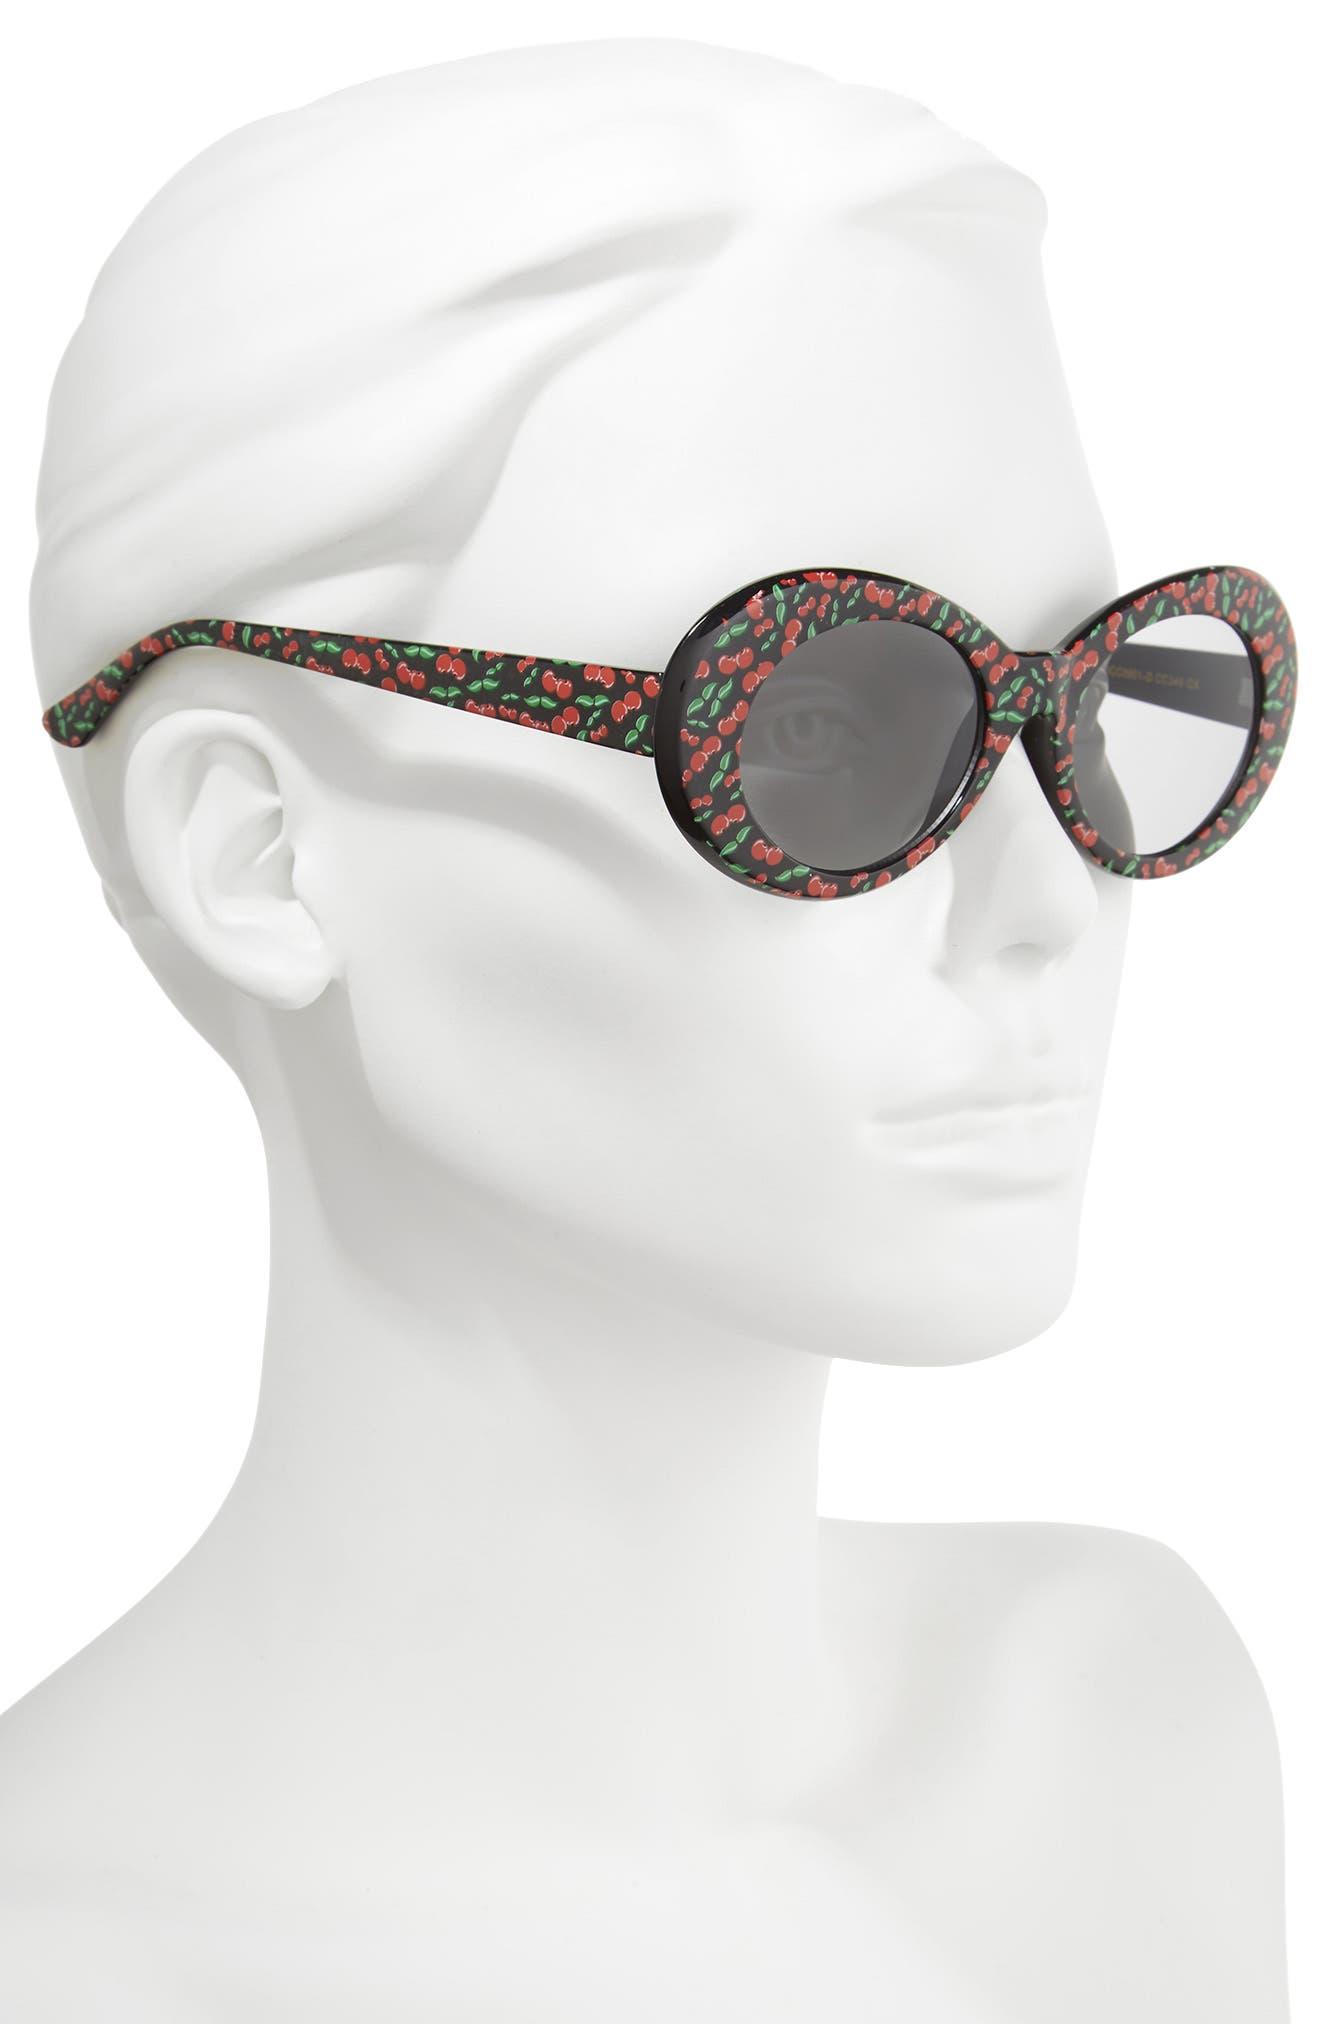 50mm Cherry Print Oval Sunglasses,                             Alternate thumbnail 2, color,                             008